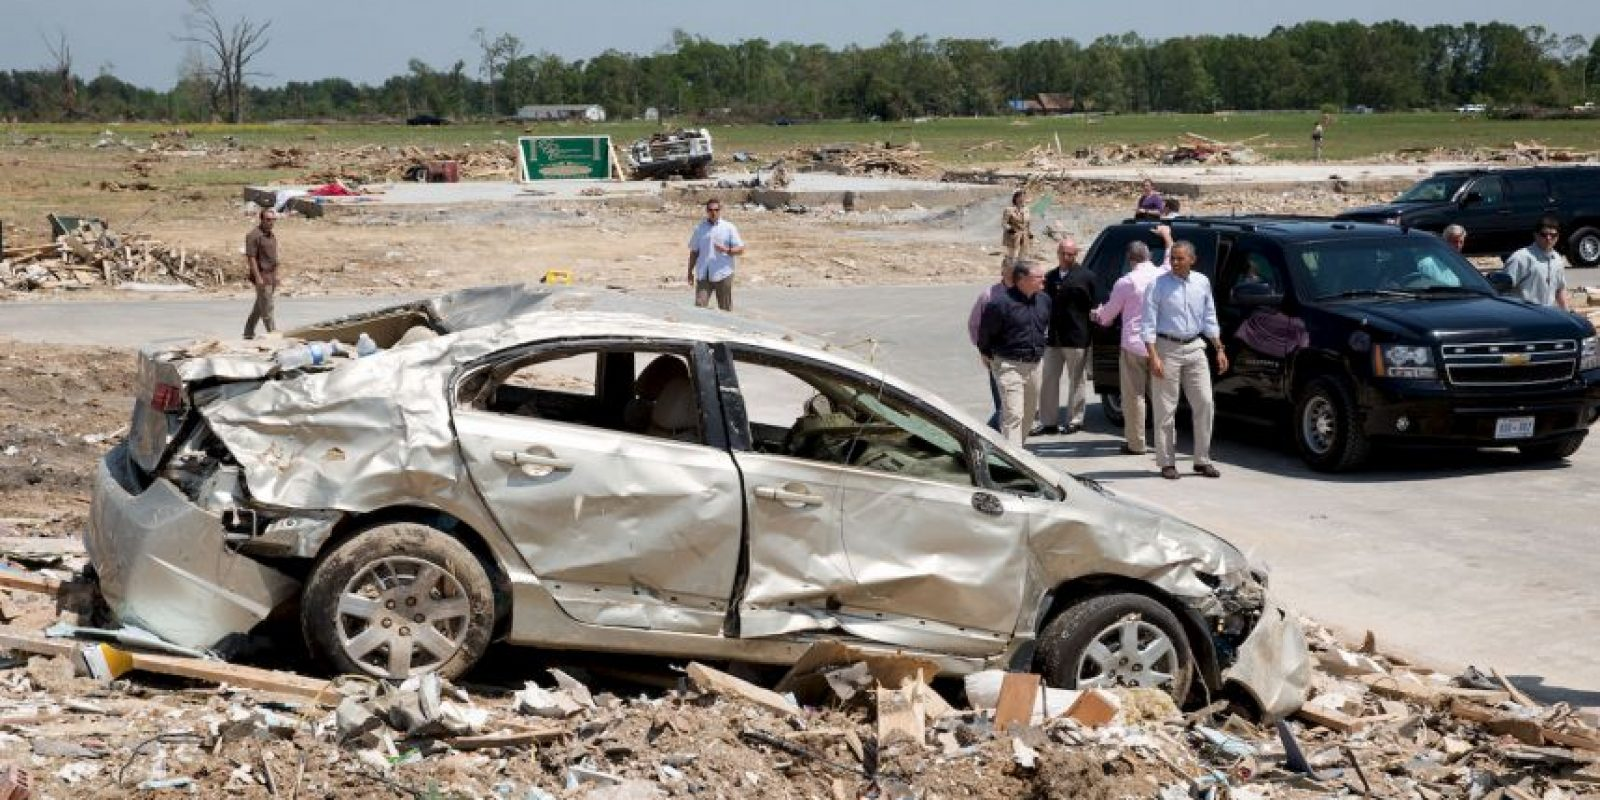 Arkansas 2014 Foto:Vía www.whitehouse.gov